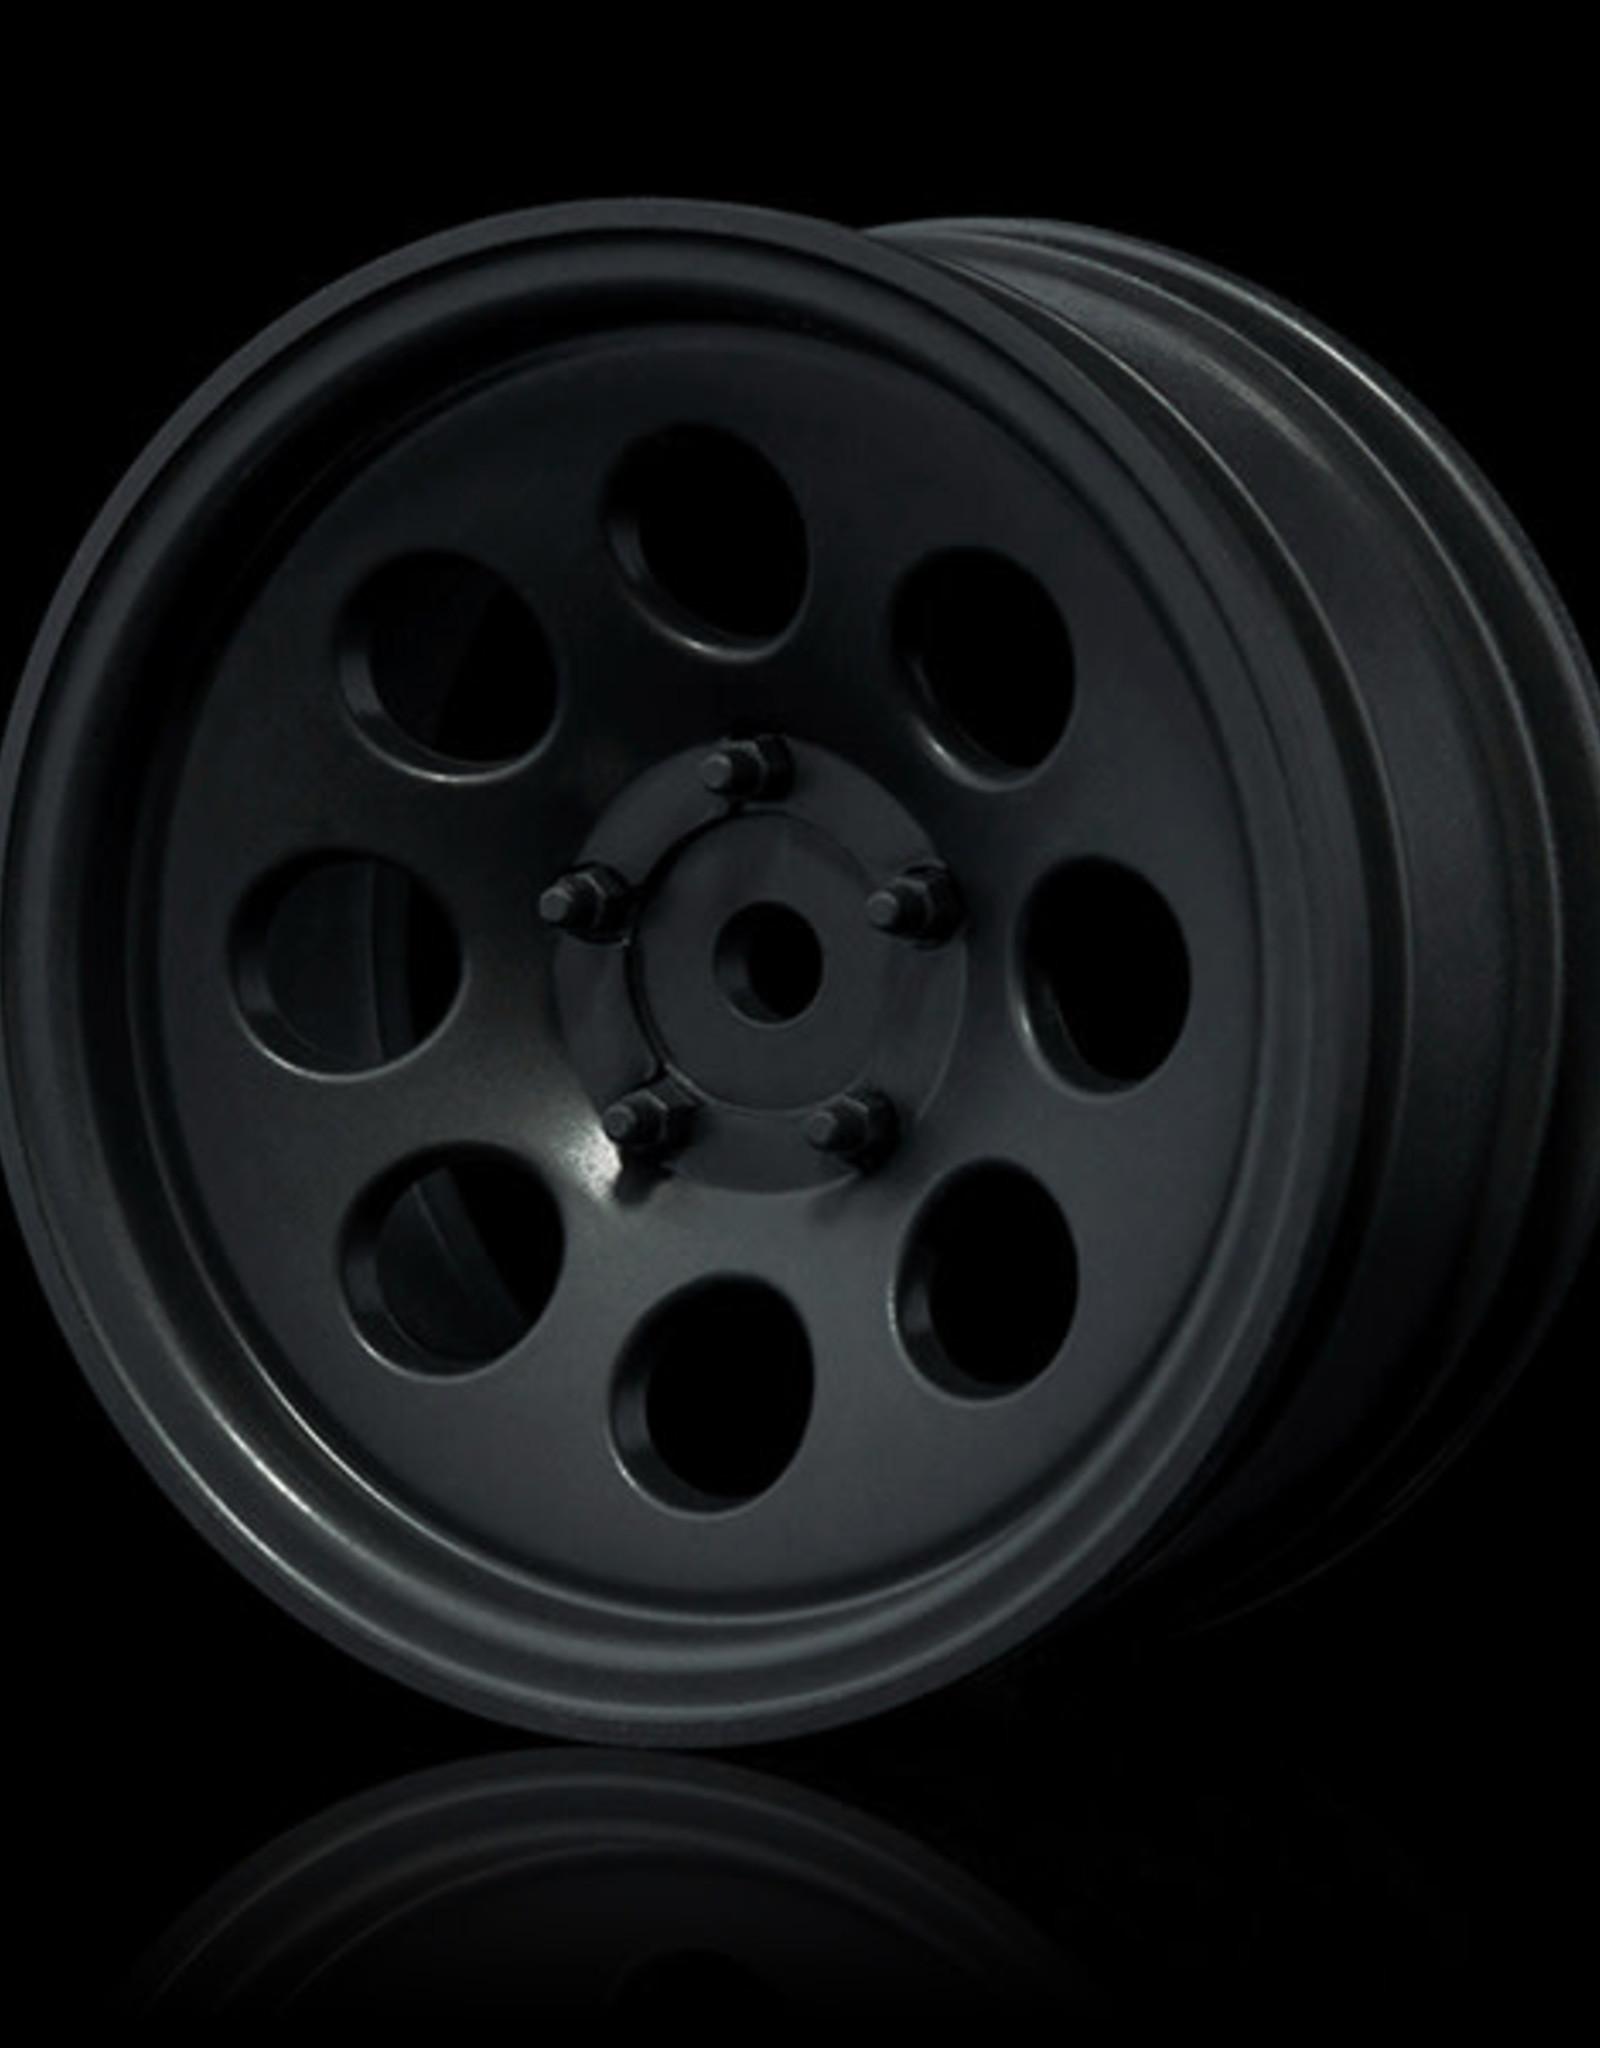 MST MXSPD230031BKF 58H 1.9'' CRAWLER WHEEL (FLAT BLACK) - MST 230031BKF